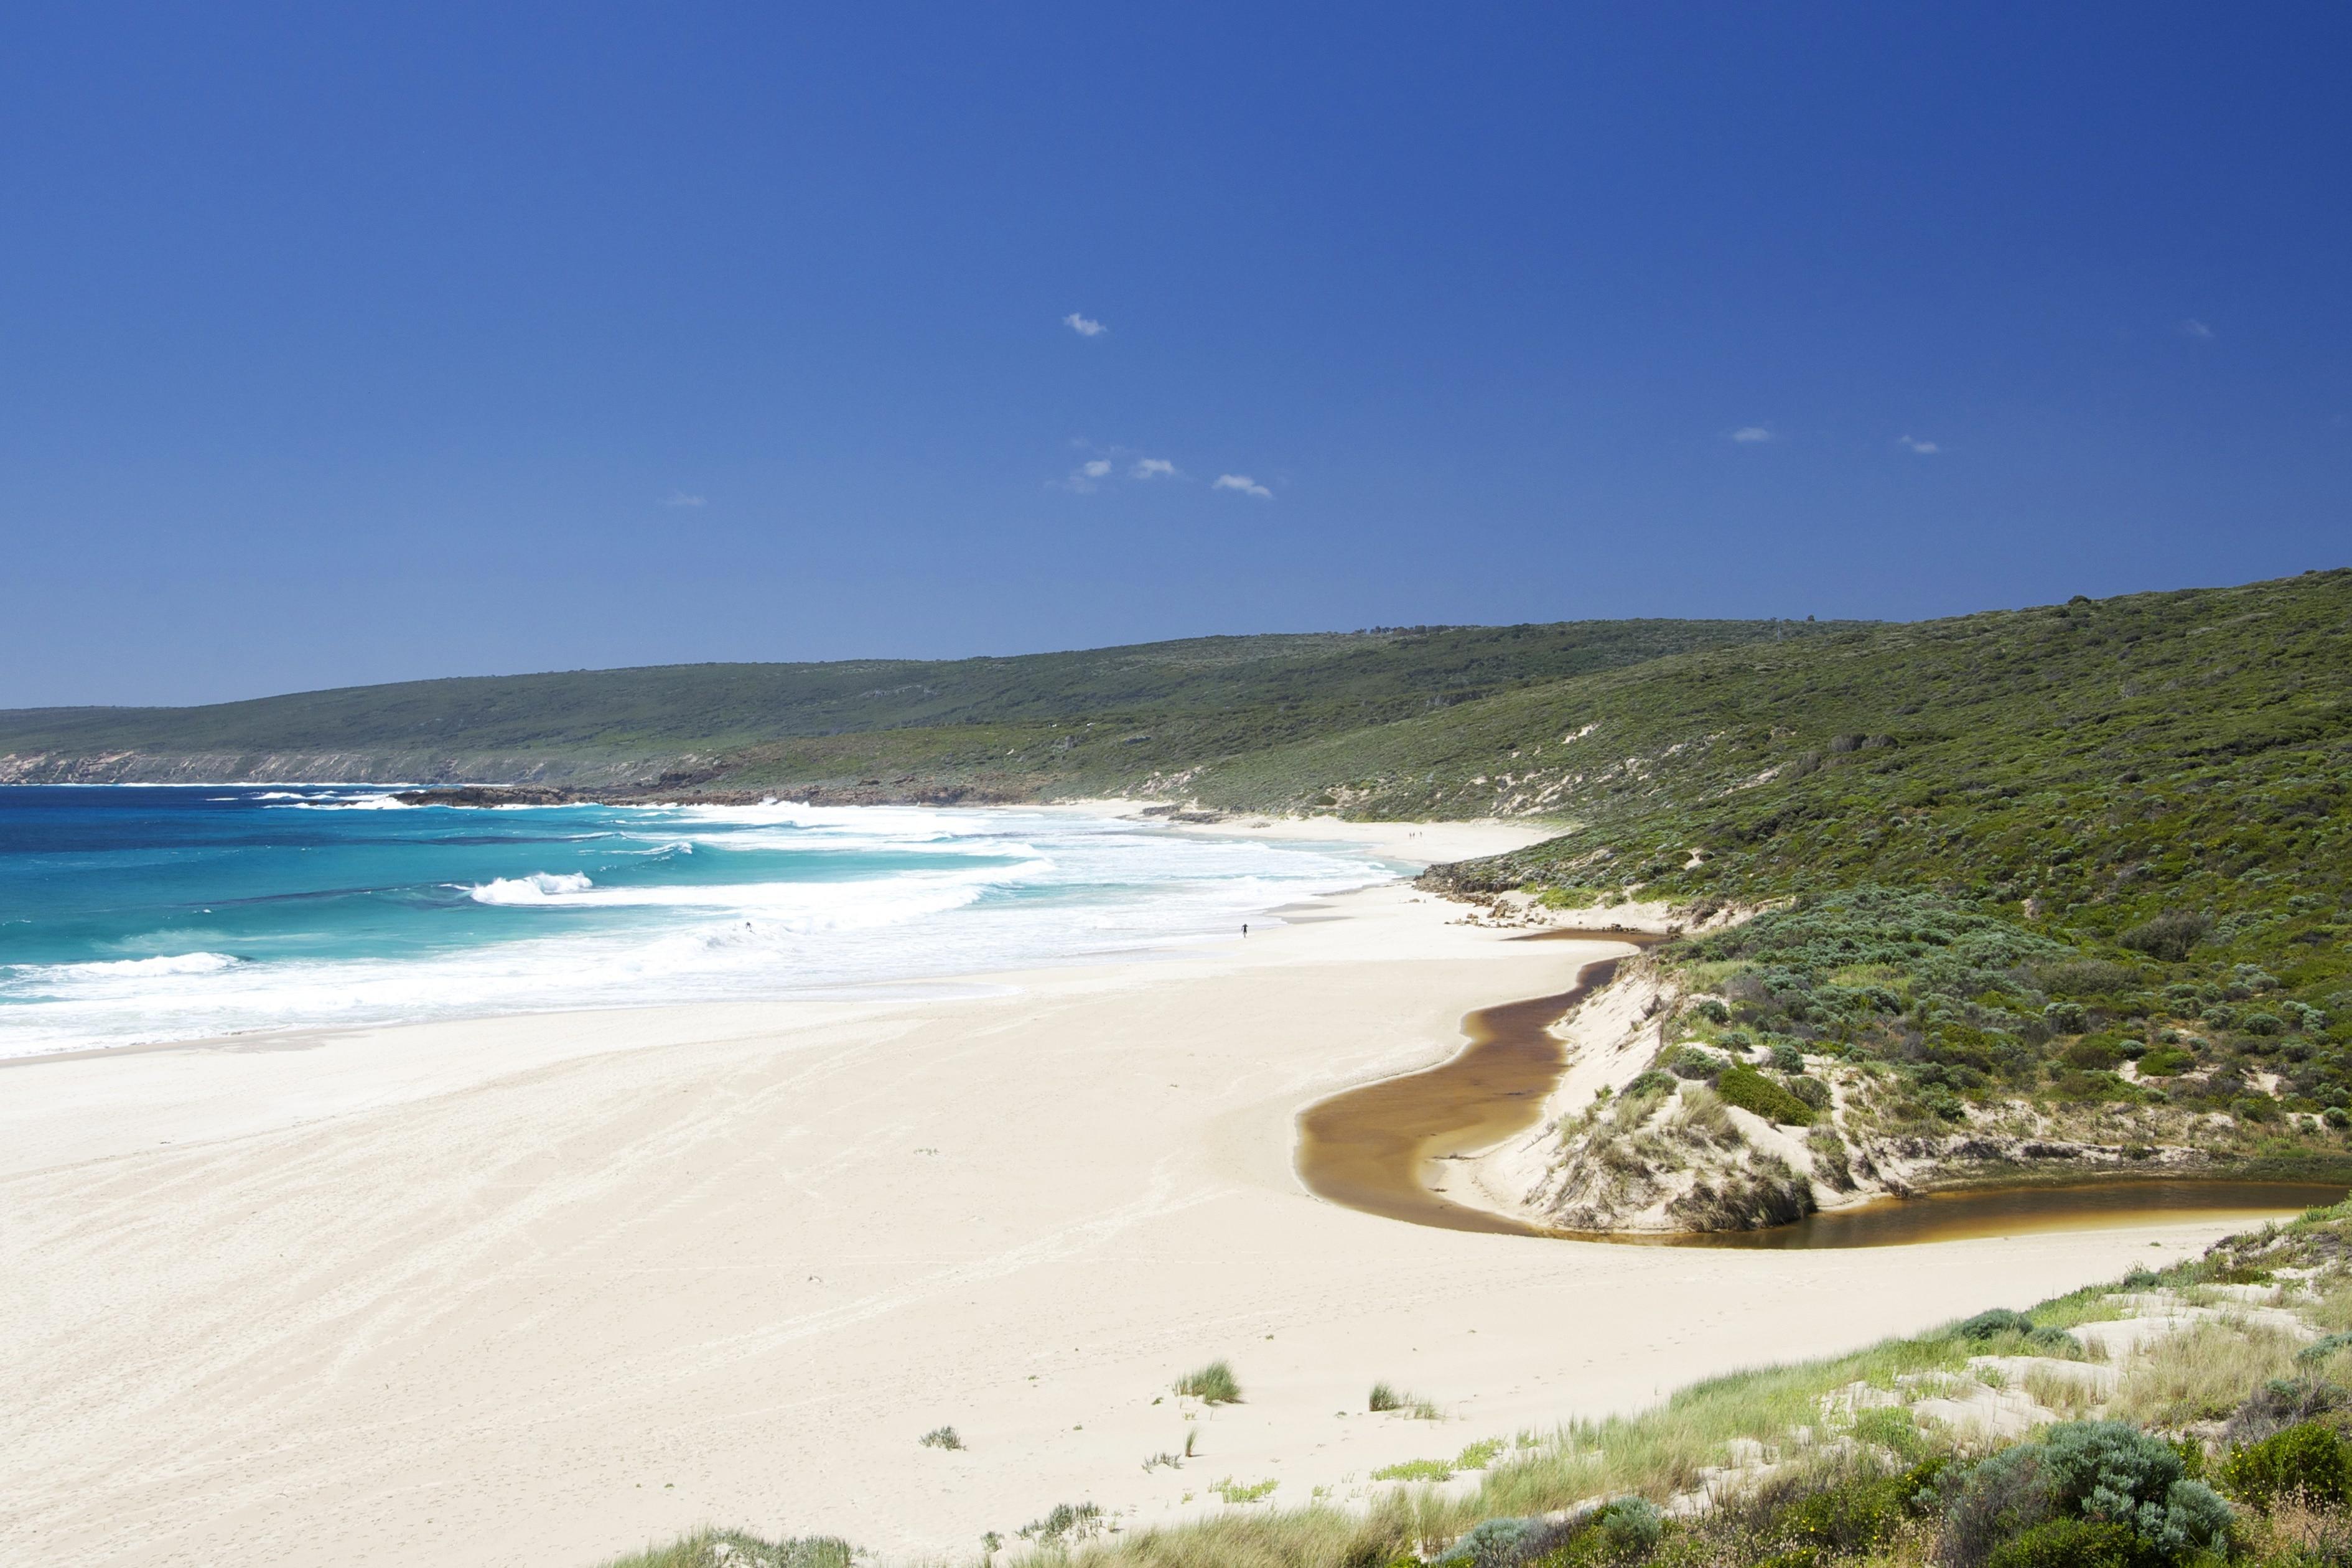 Smiths Beach, Bass Coast Shire, Victoria, Australia